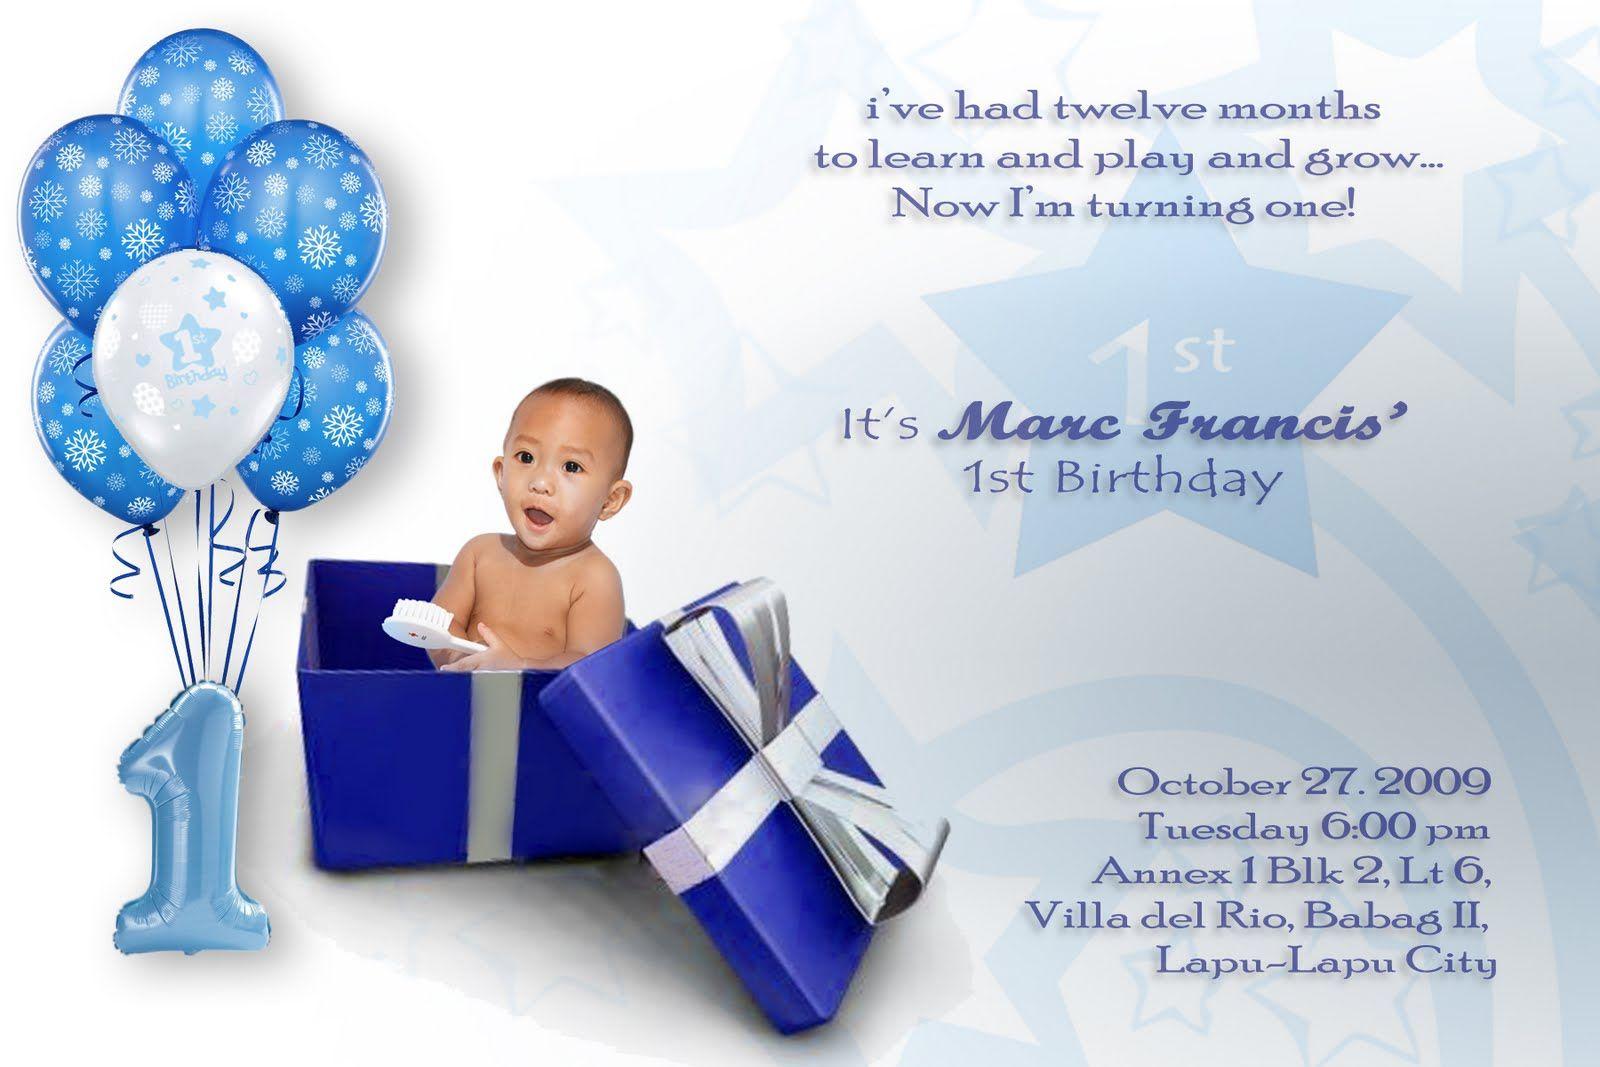 5 Elegant Birthday Invitation Templates for 5 Year Old Boy Photos